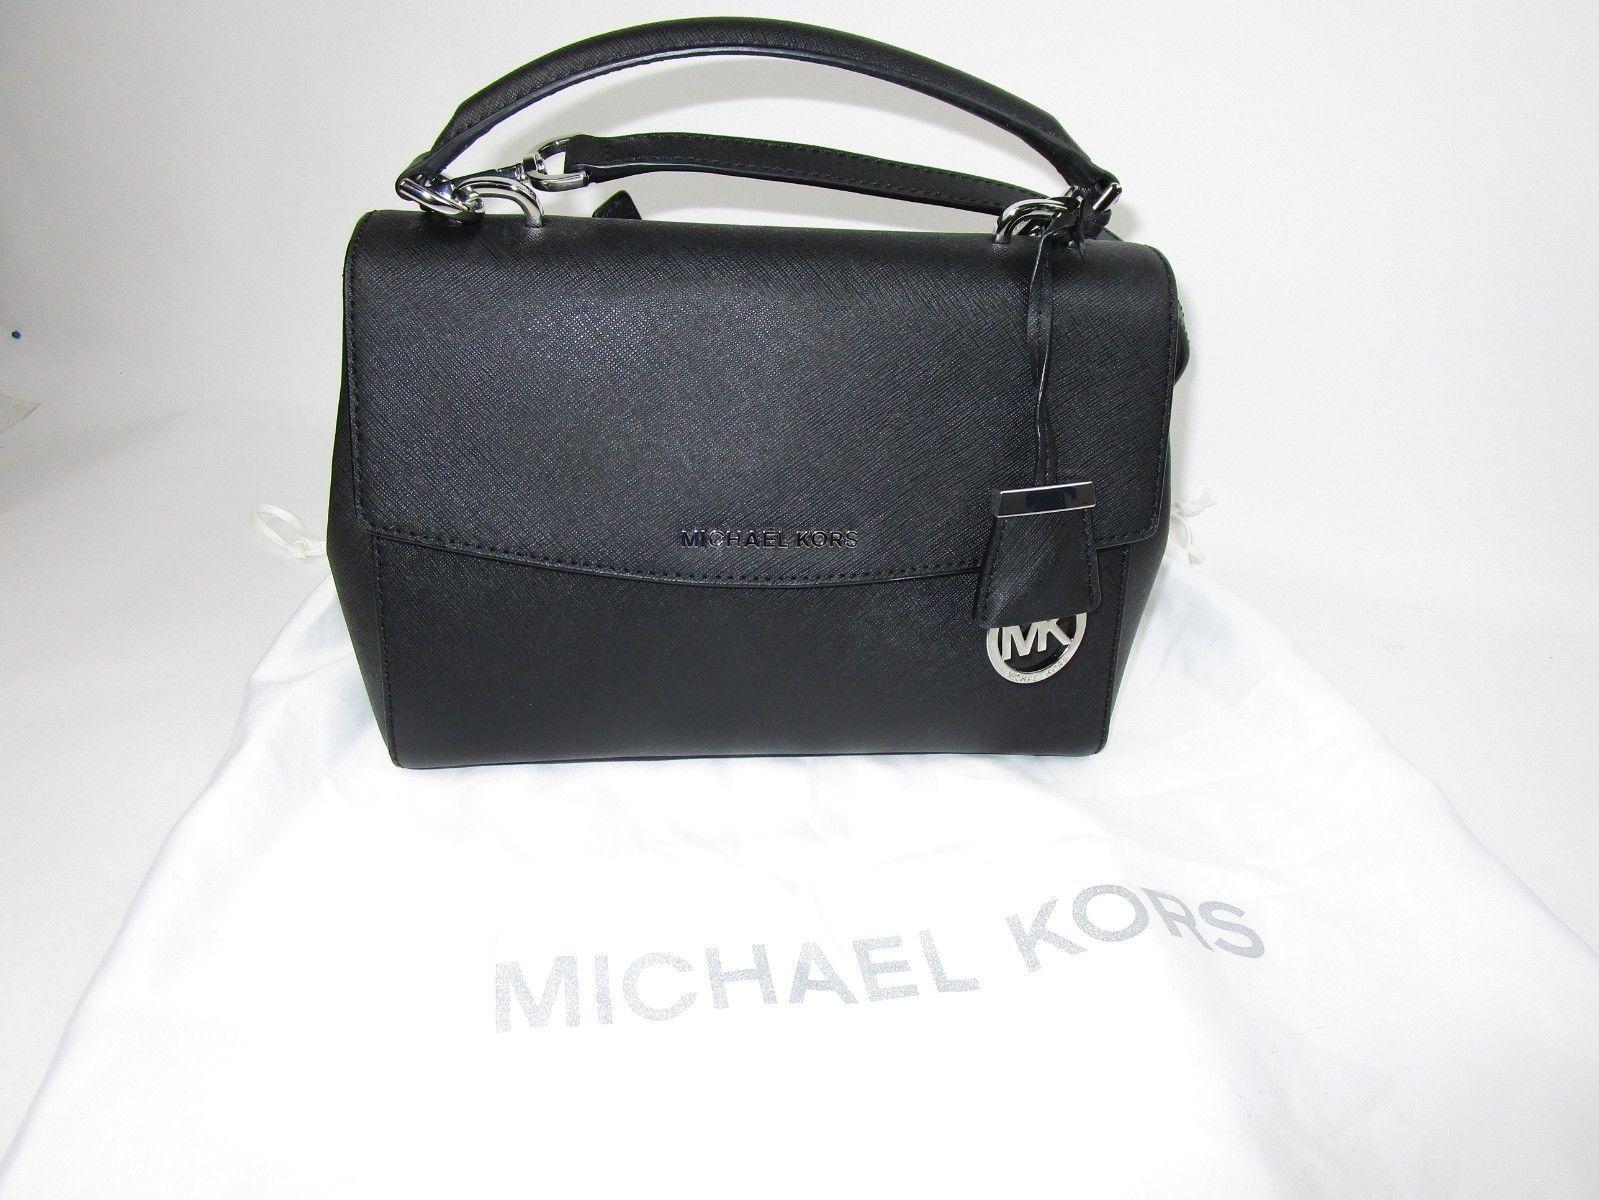 f3c13476a4c51 Michael Kors Ava Small Top Handle Satchel and 50 similar items. 57